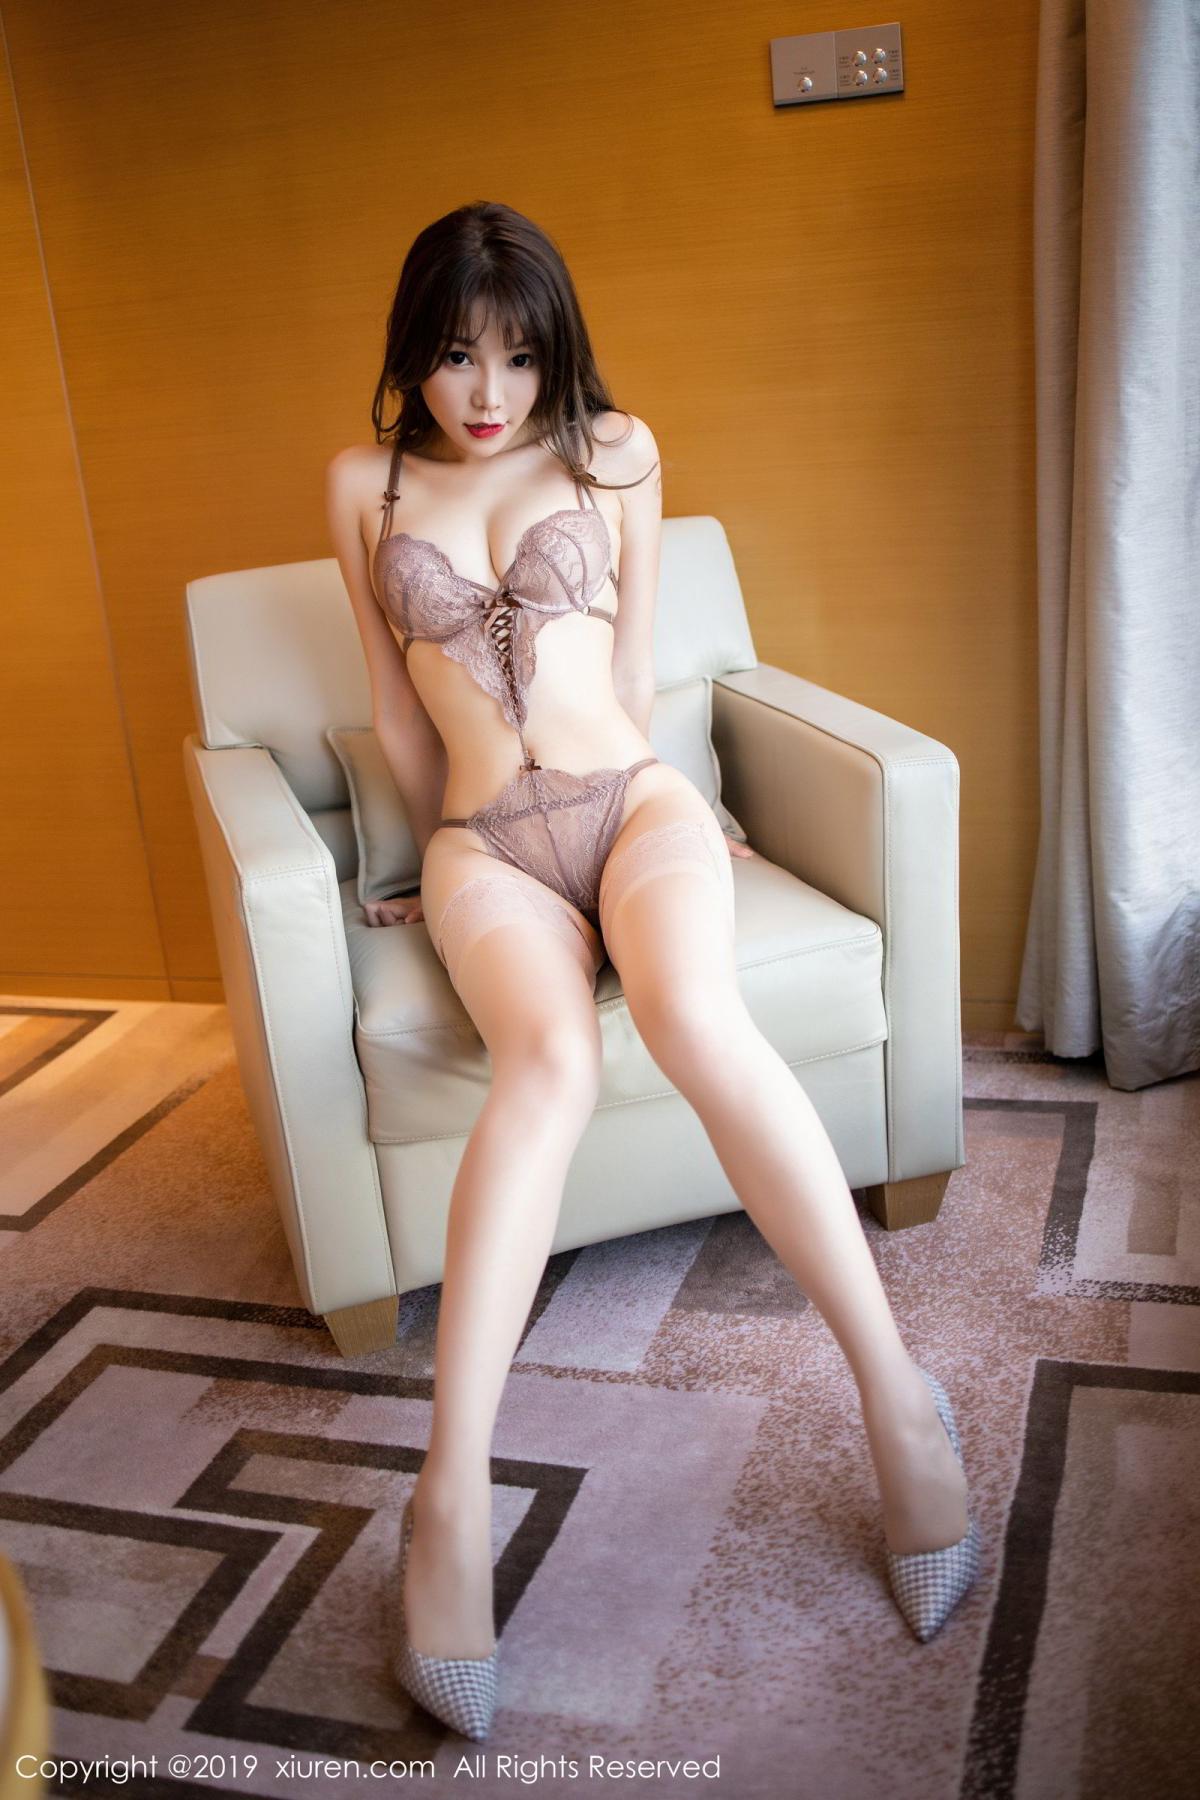 [XiuRen] Vol.1675 Chen Zhi 36P, Chen Zhi, Cheongsam, Tall, Underwear, Xiuren